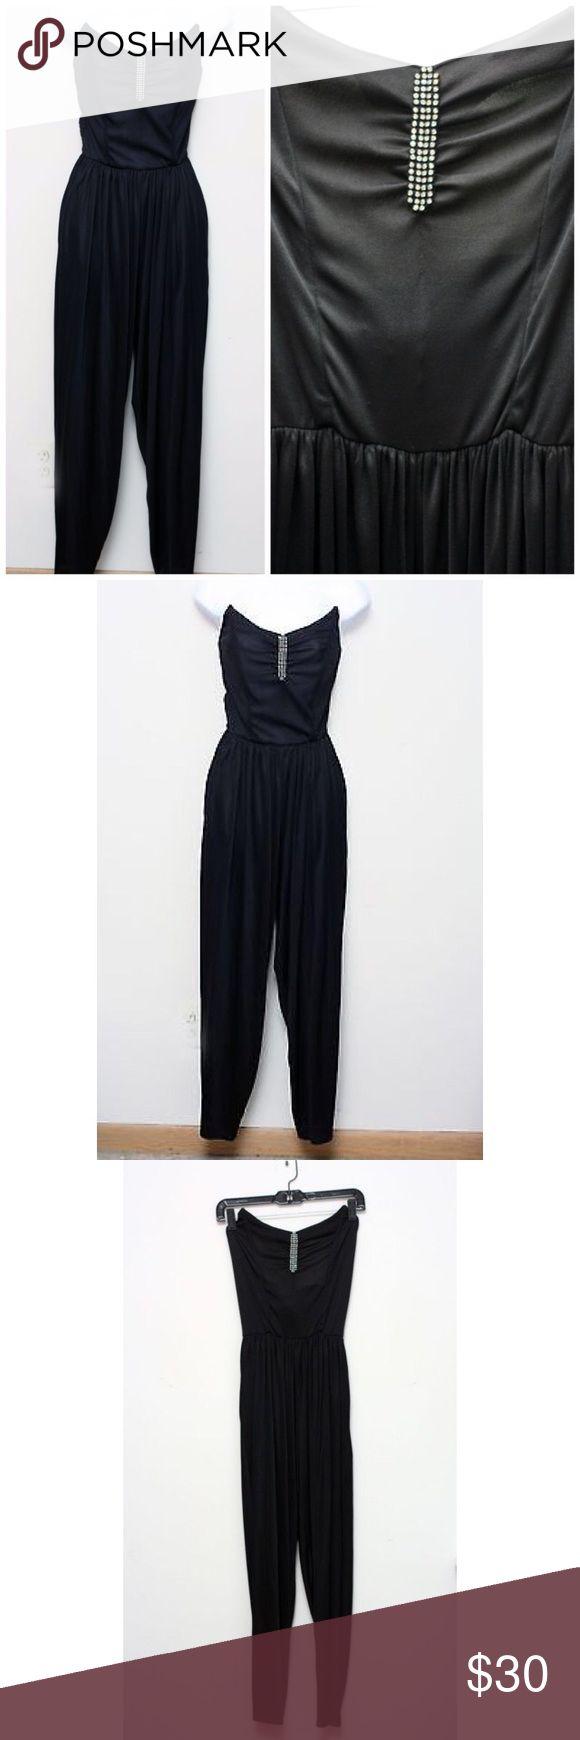 "Vtg 80s Black Stretch Strapless Bandeau Jumpsuit Vtg 80s Black Stretch Strapless Bandeau Jumpsuit. Sweetheart plunge neckline with rhinestone embellishments.  Measurements (flat / un-stretched):  Tagged Size: 8 Bust: 31"" Inseam: 28"" Vintage Pants Jumpsuits & Rompers"